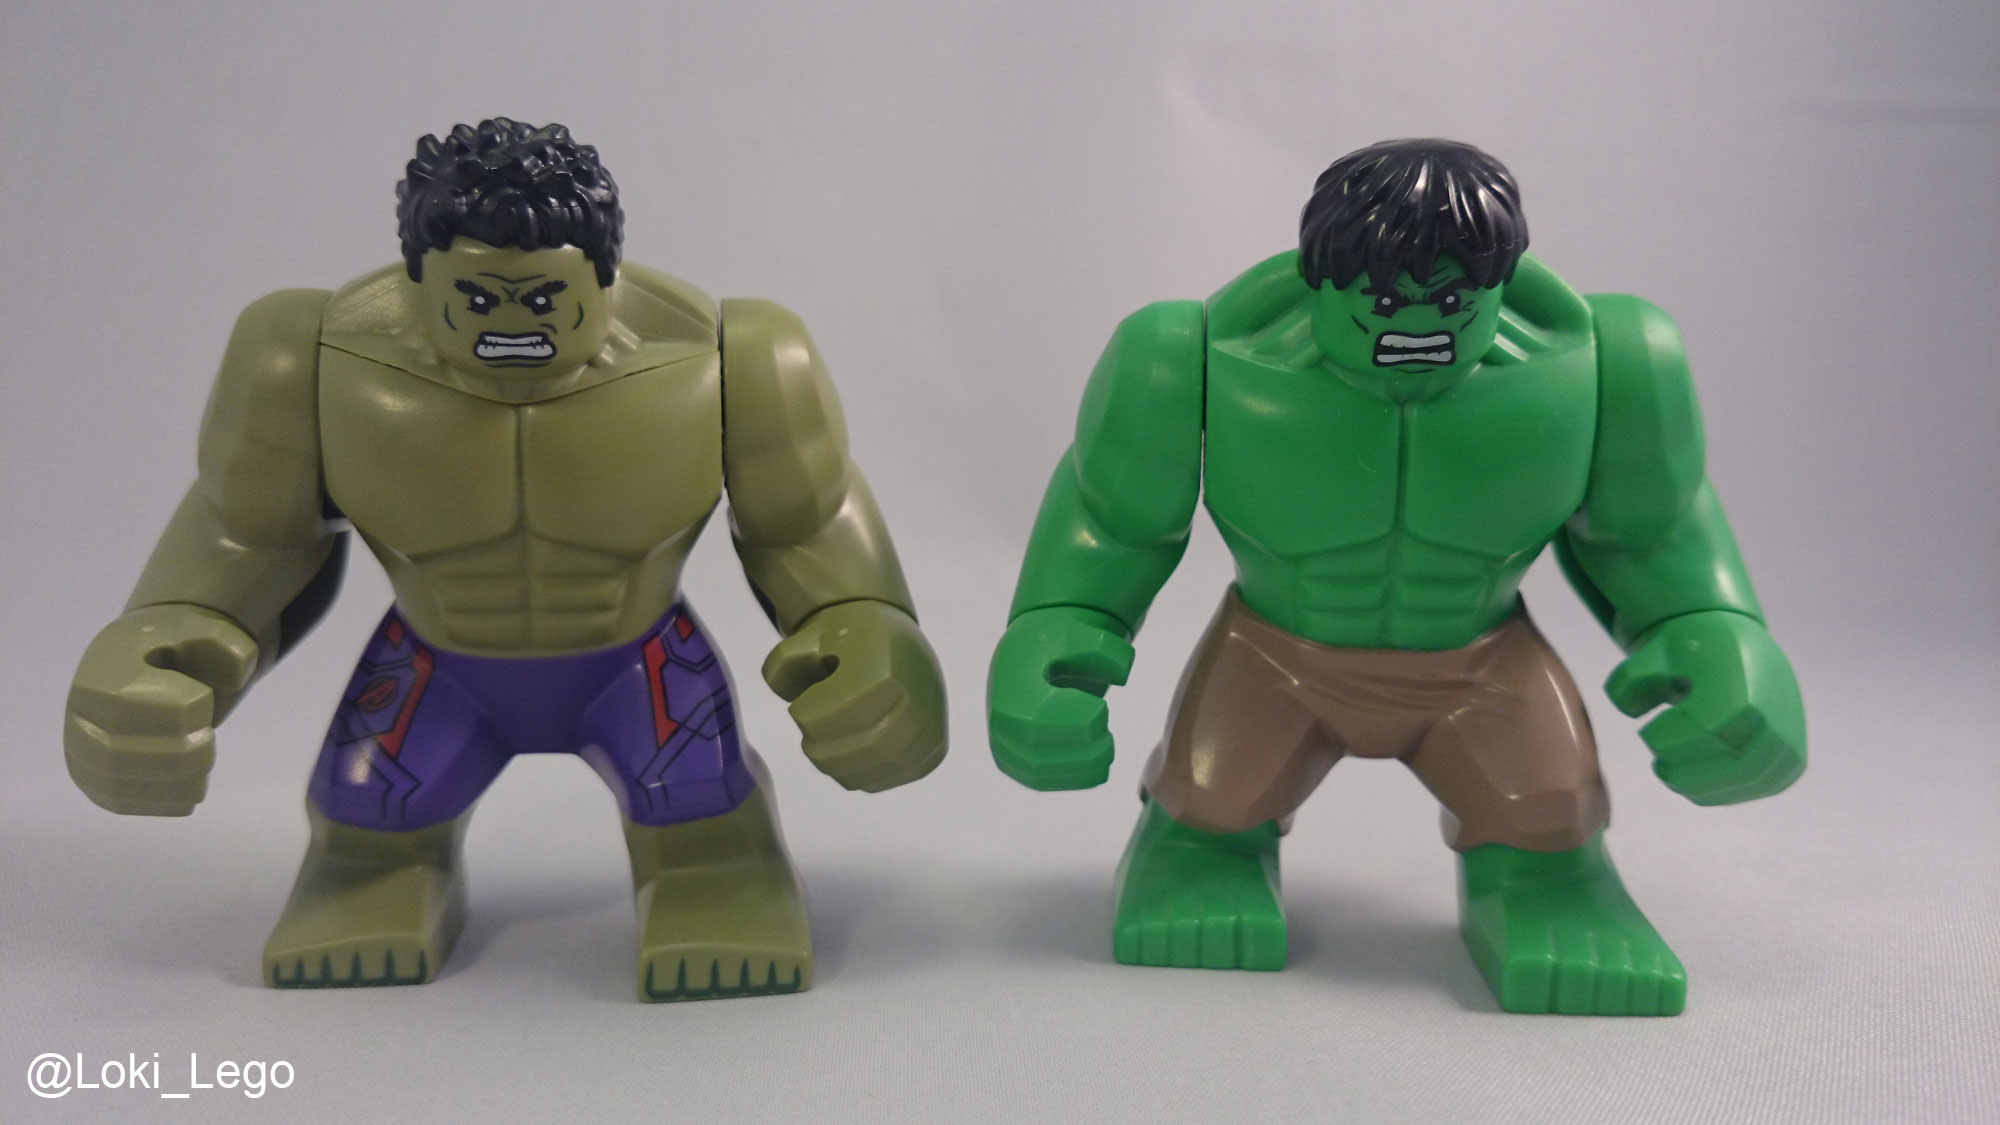 lego avengers hulk vs thor - photo #17